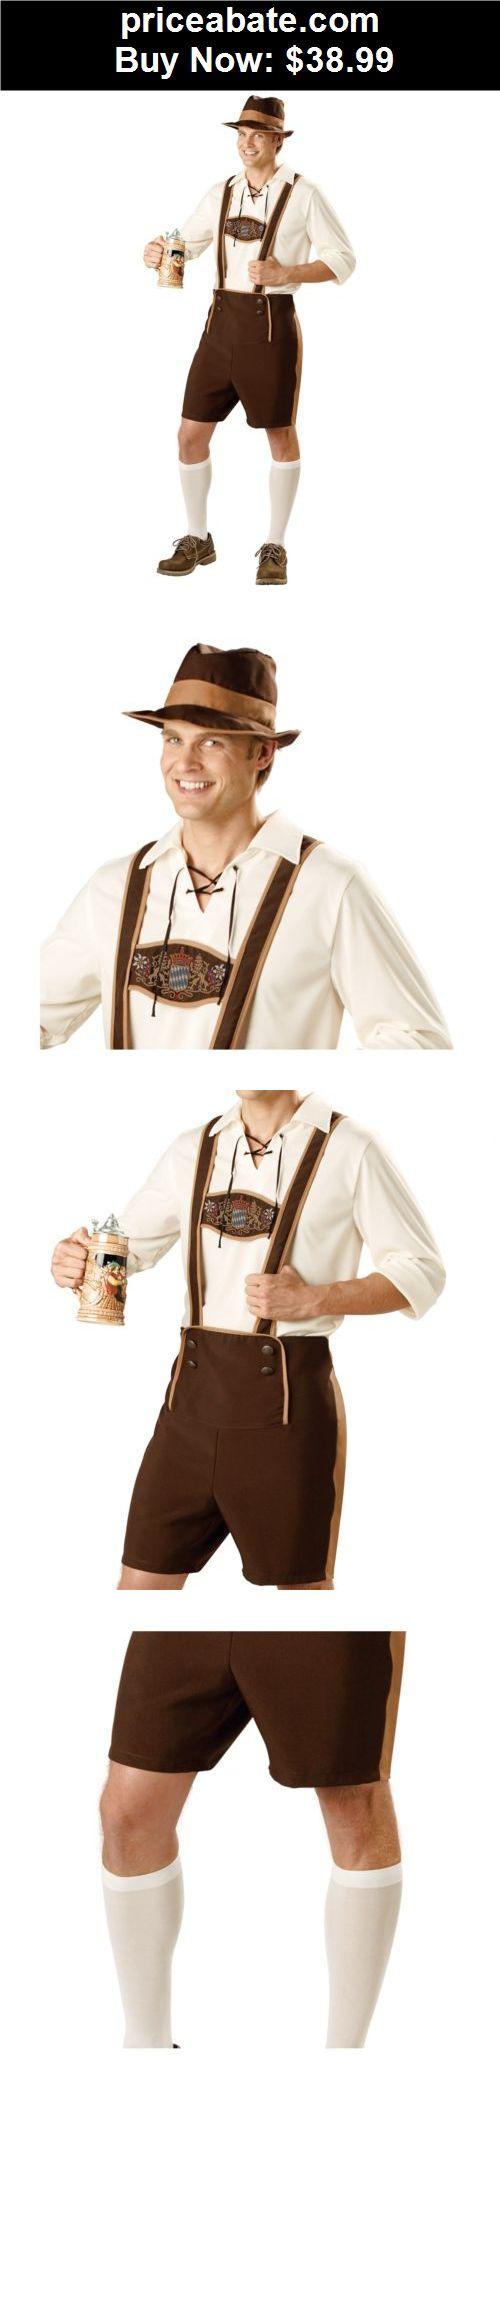 Men-Costumes: Lederhosen Costume Adult German Beer Bavarian Guy Oktoberfest Fancy Dress - BUY IT NOW ONLY $38.99